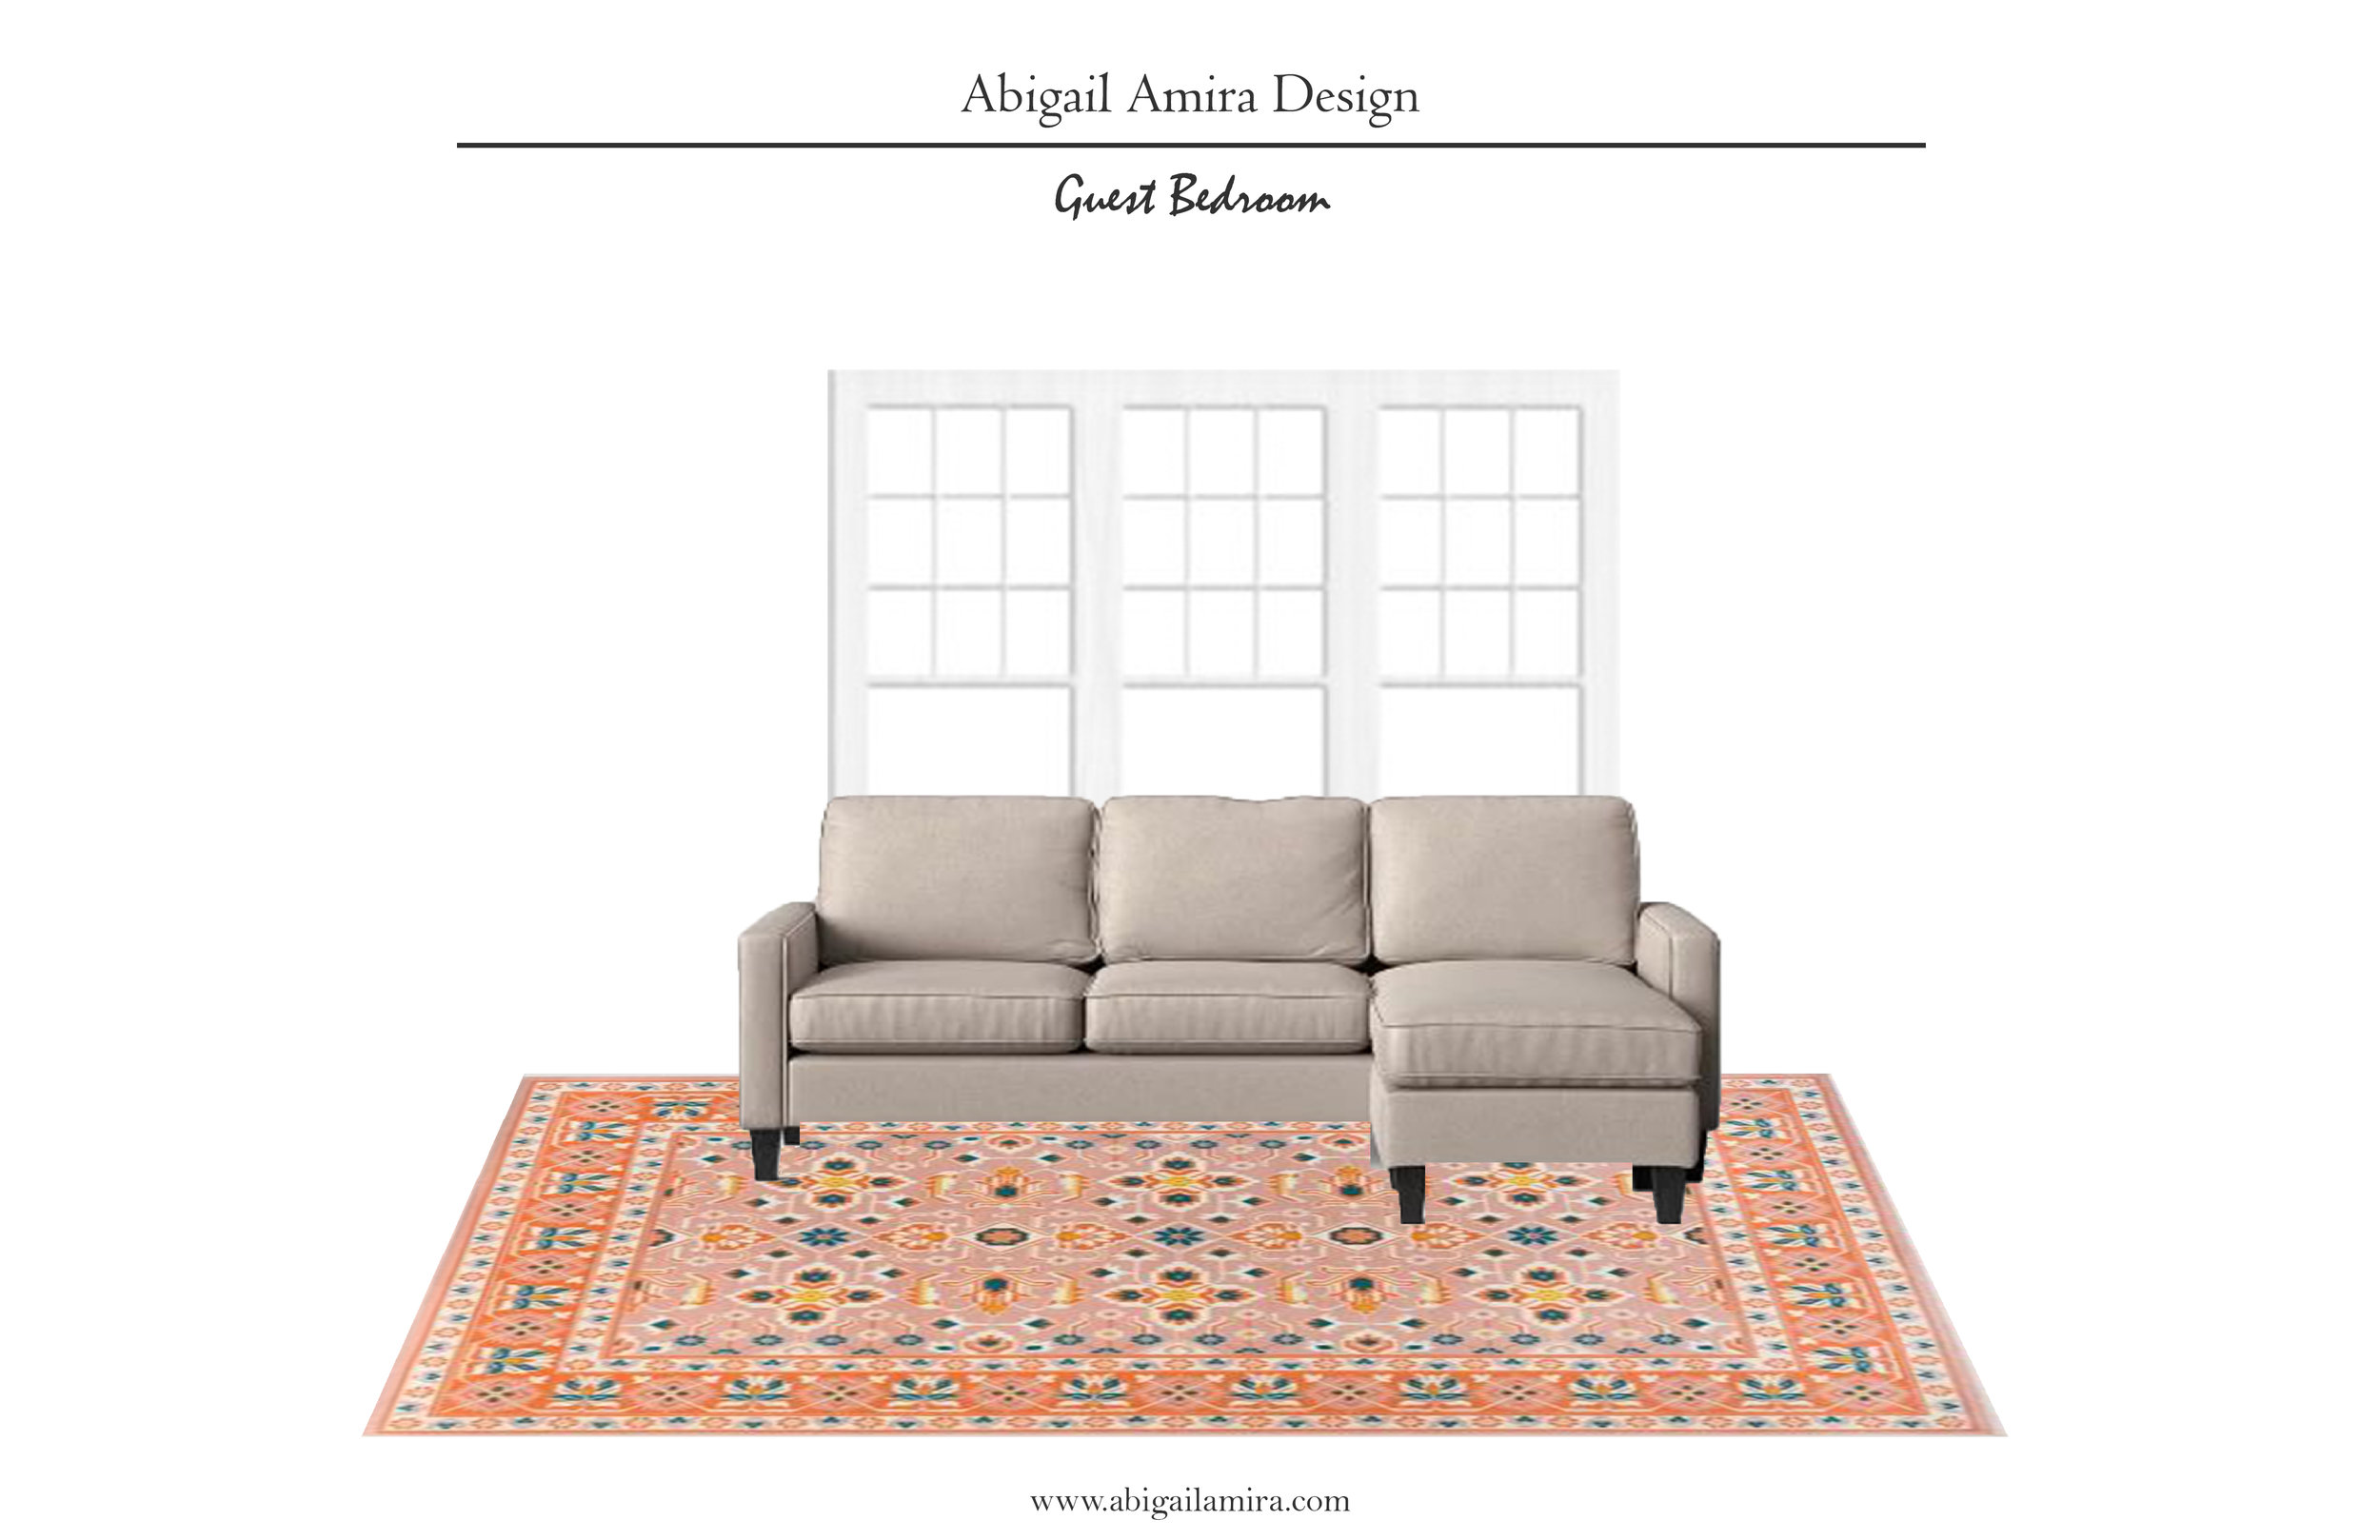 www.abigailamira.com